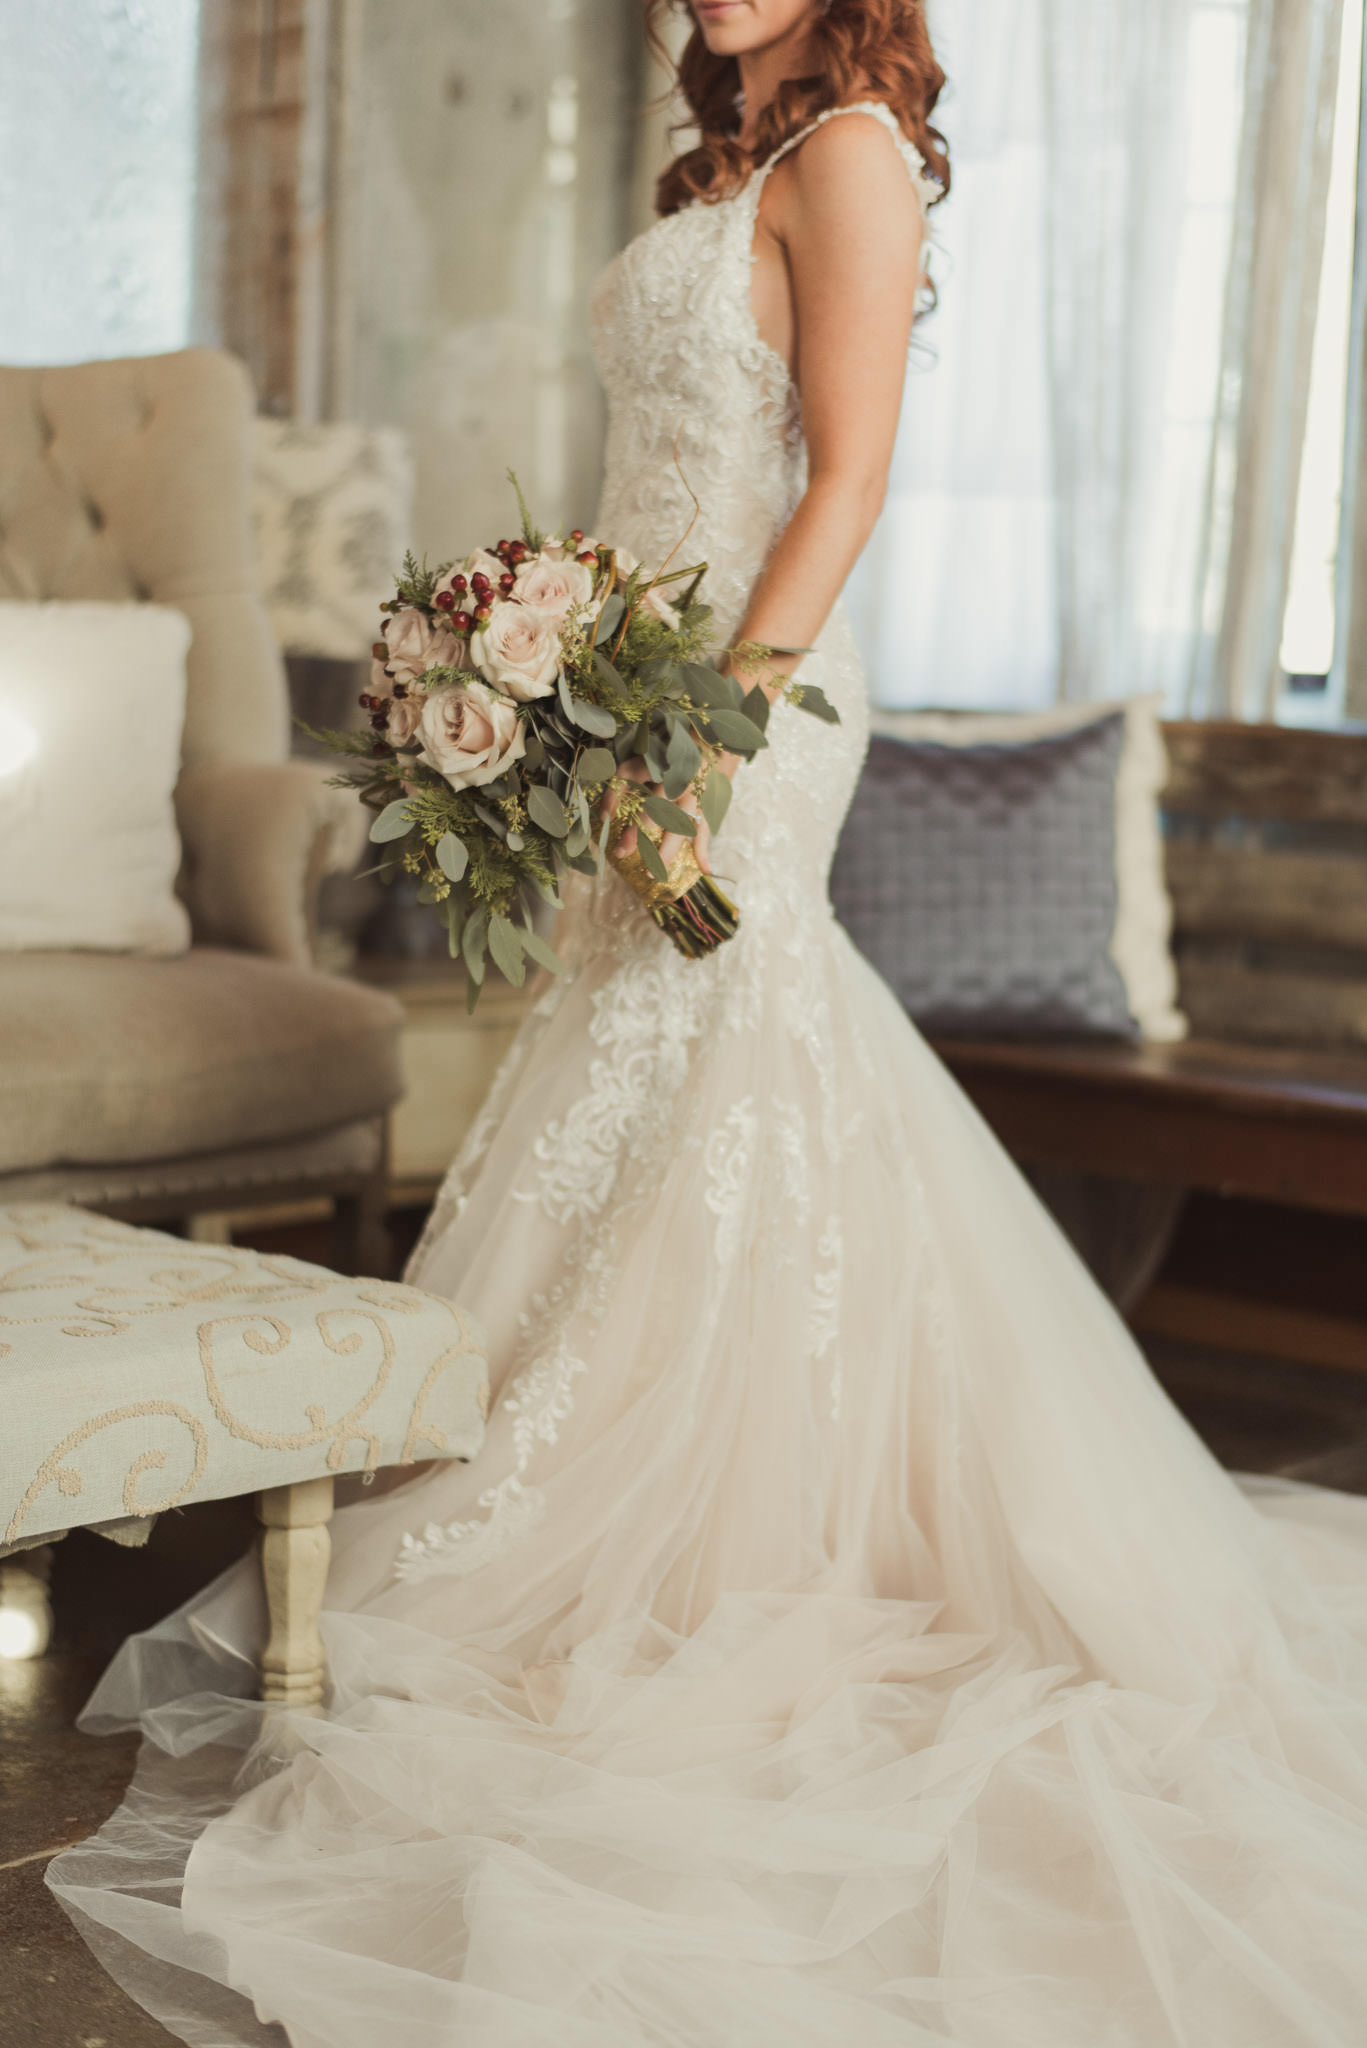 Cynthia-Curtis-Olde-Dobbine-Station-Houston-Wedding-Photographer-sm-34.jpg